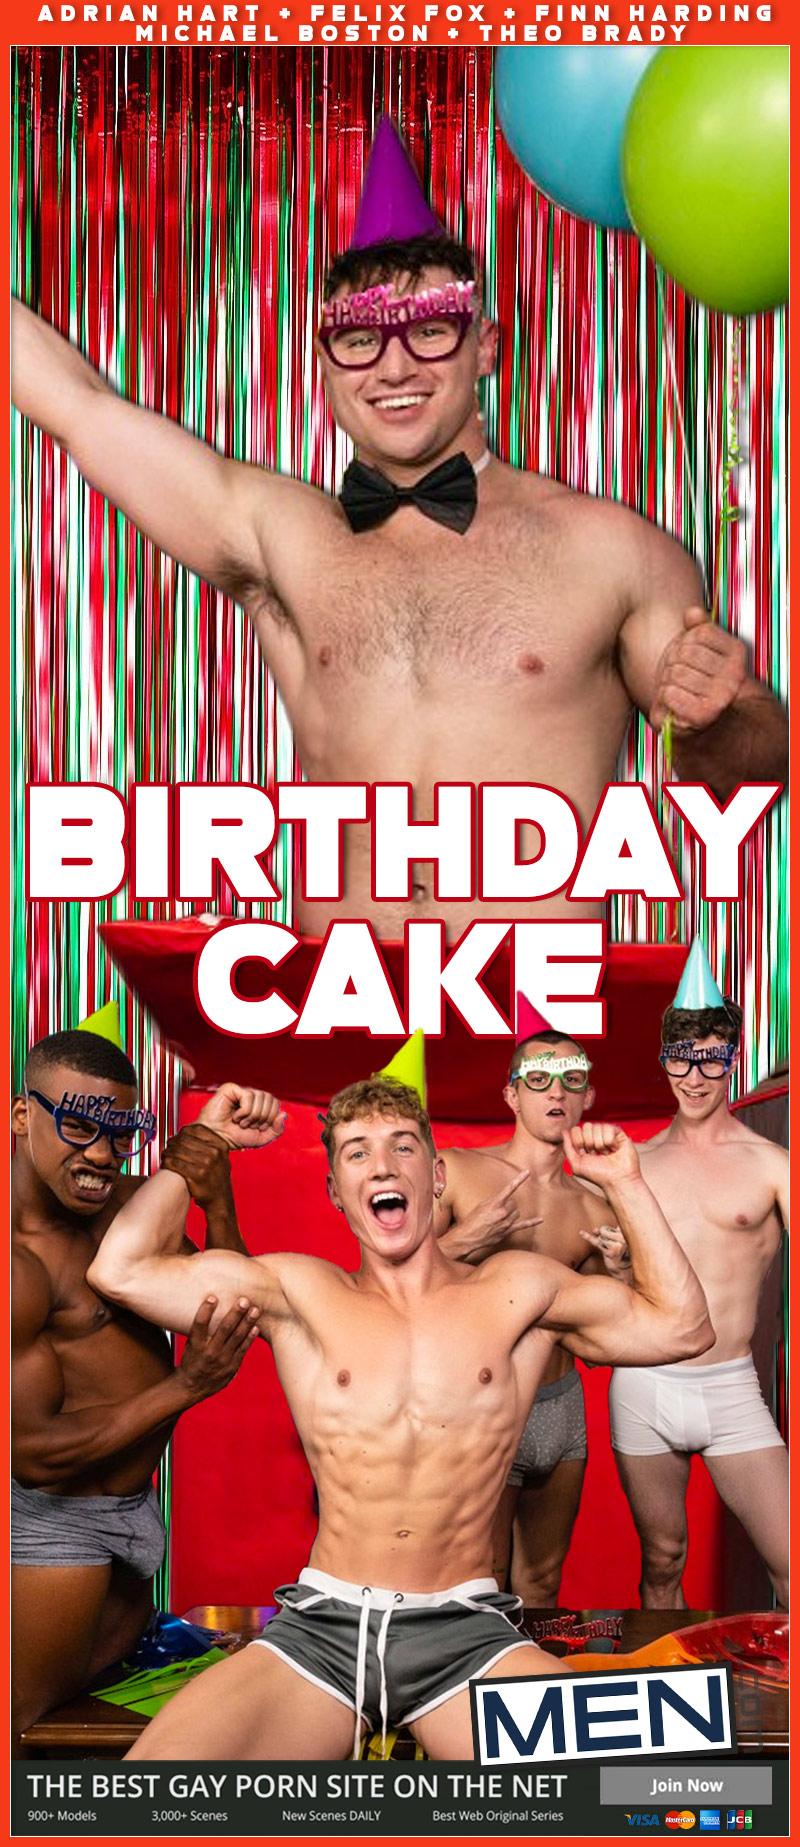 Birthday Cake - Michael Boston and Felix Fox Cover